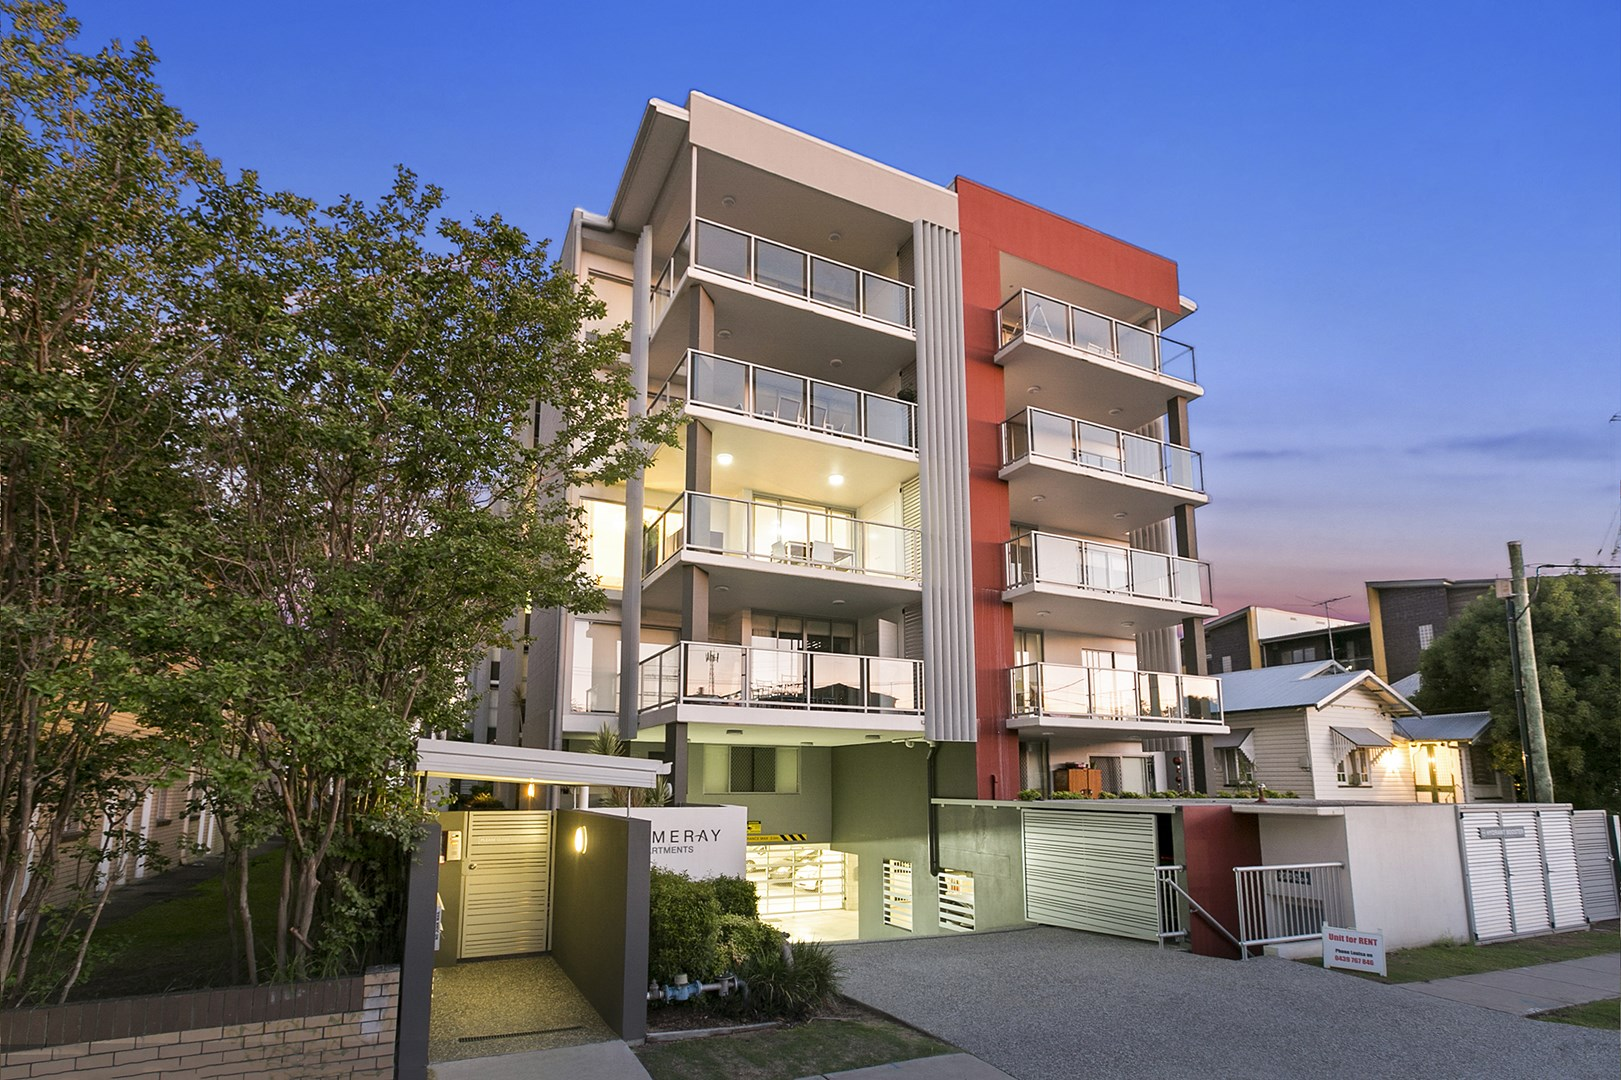 14/28 Carl Street, Woolloongabba QLD 4102, Image 0